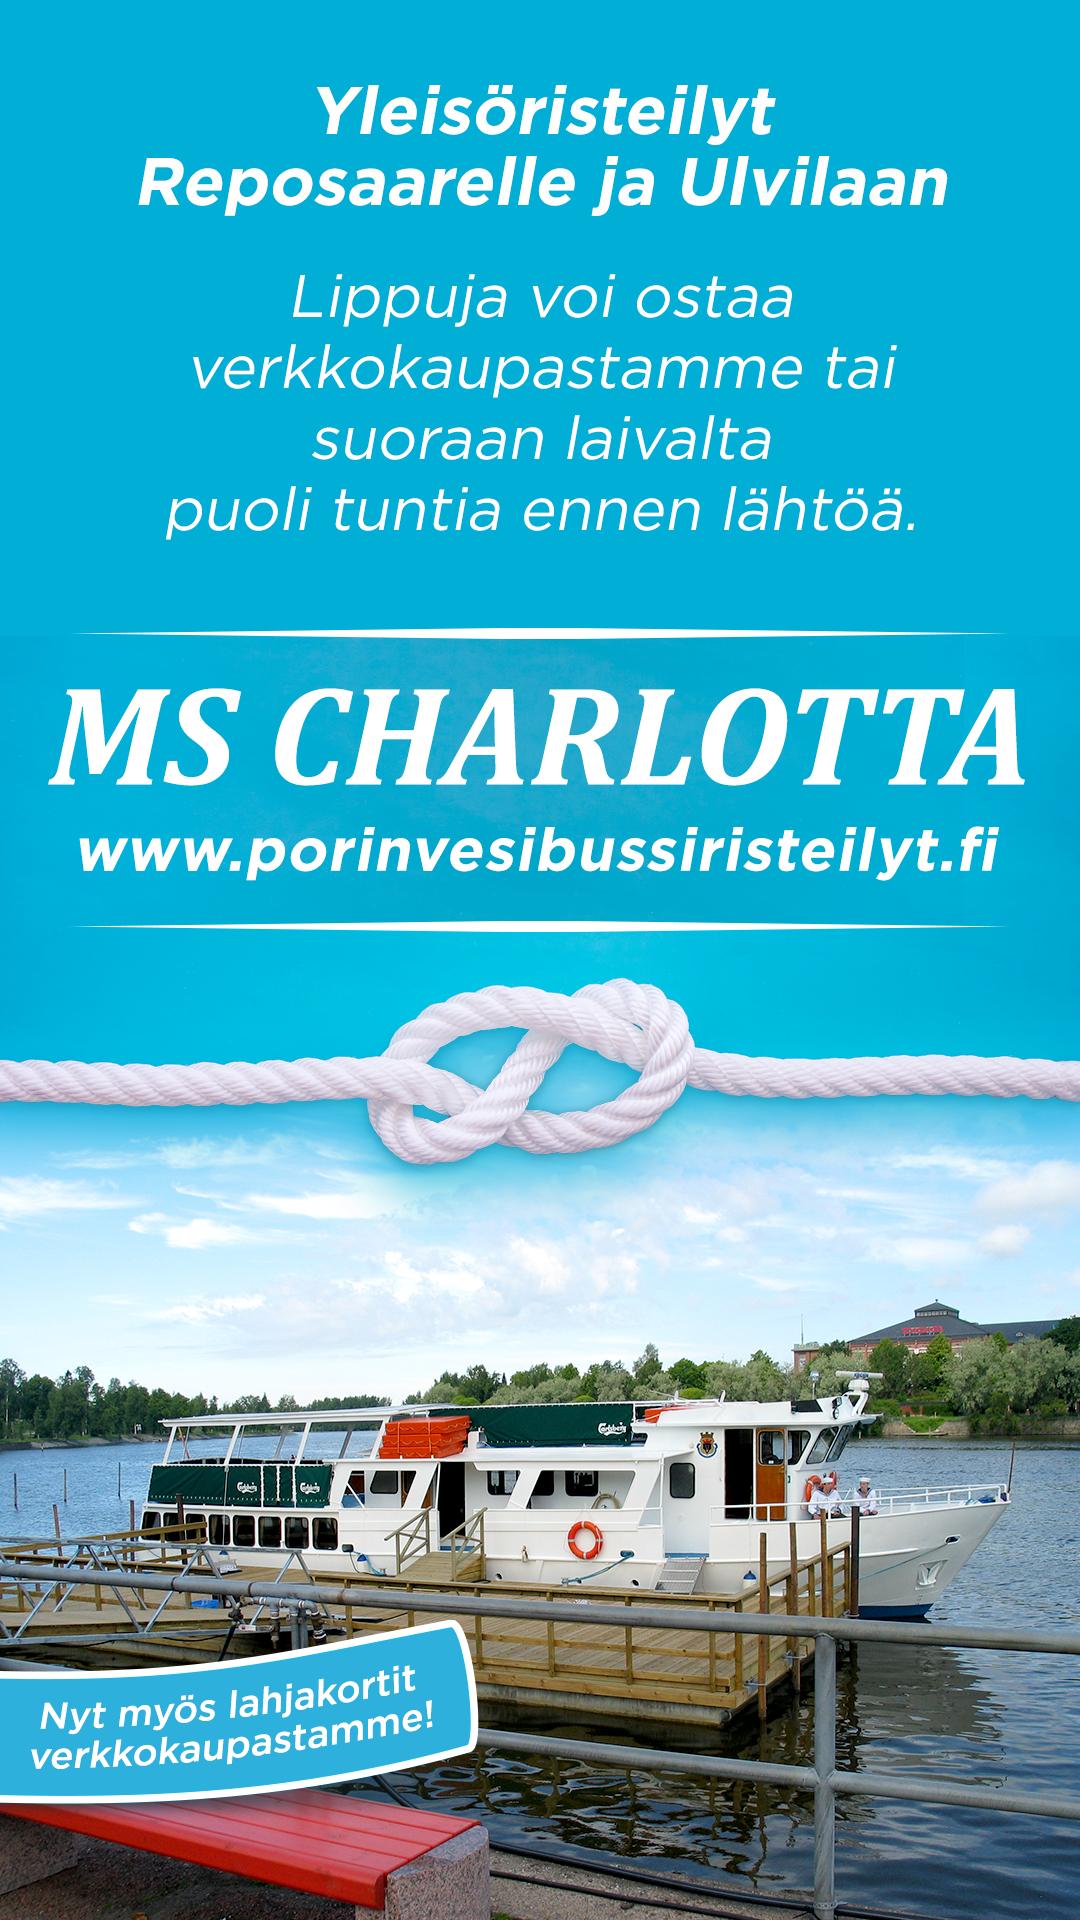 Yleisöristeily Porista Ulvilaan ke 15.7